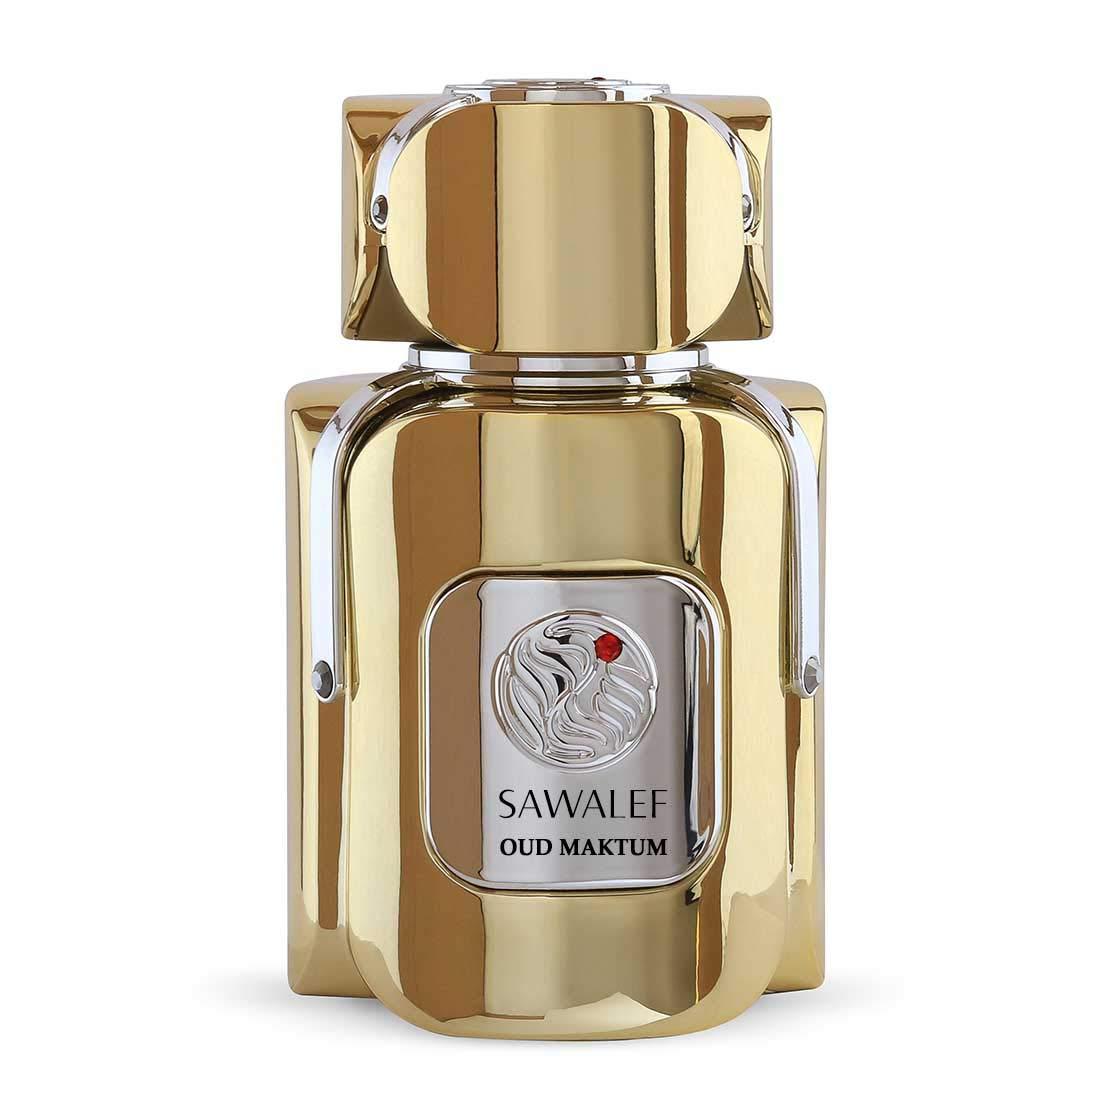 OUD MAKTUM, Eau de Parfum 80 mL from the SAWALEF Boutique Range | Unisex Oriental Oud Niche Release | Long Lasting with Intense Sillage | Perfume for Women and Confident Men | by Swiss Arabian Oudh